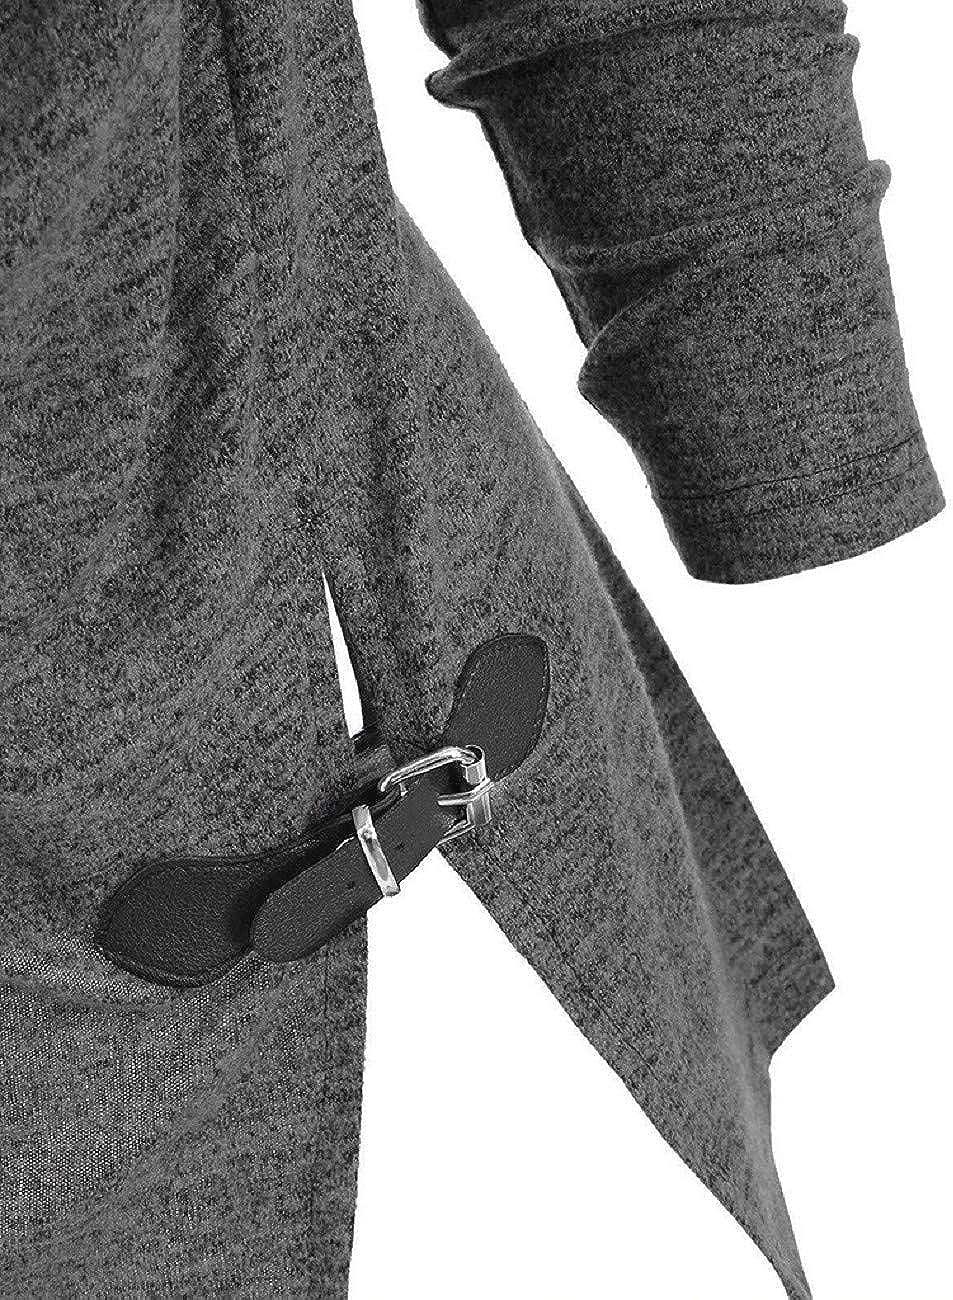 FAPIZI Womens Tunic Tops Shirt Plus Size Solid Turtleneck Tee Raglan Long Sleeve Split Pullover Blouse Sweatshirt